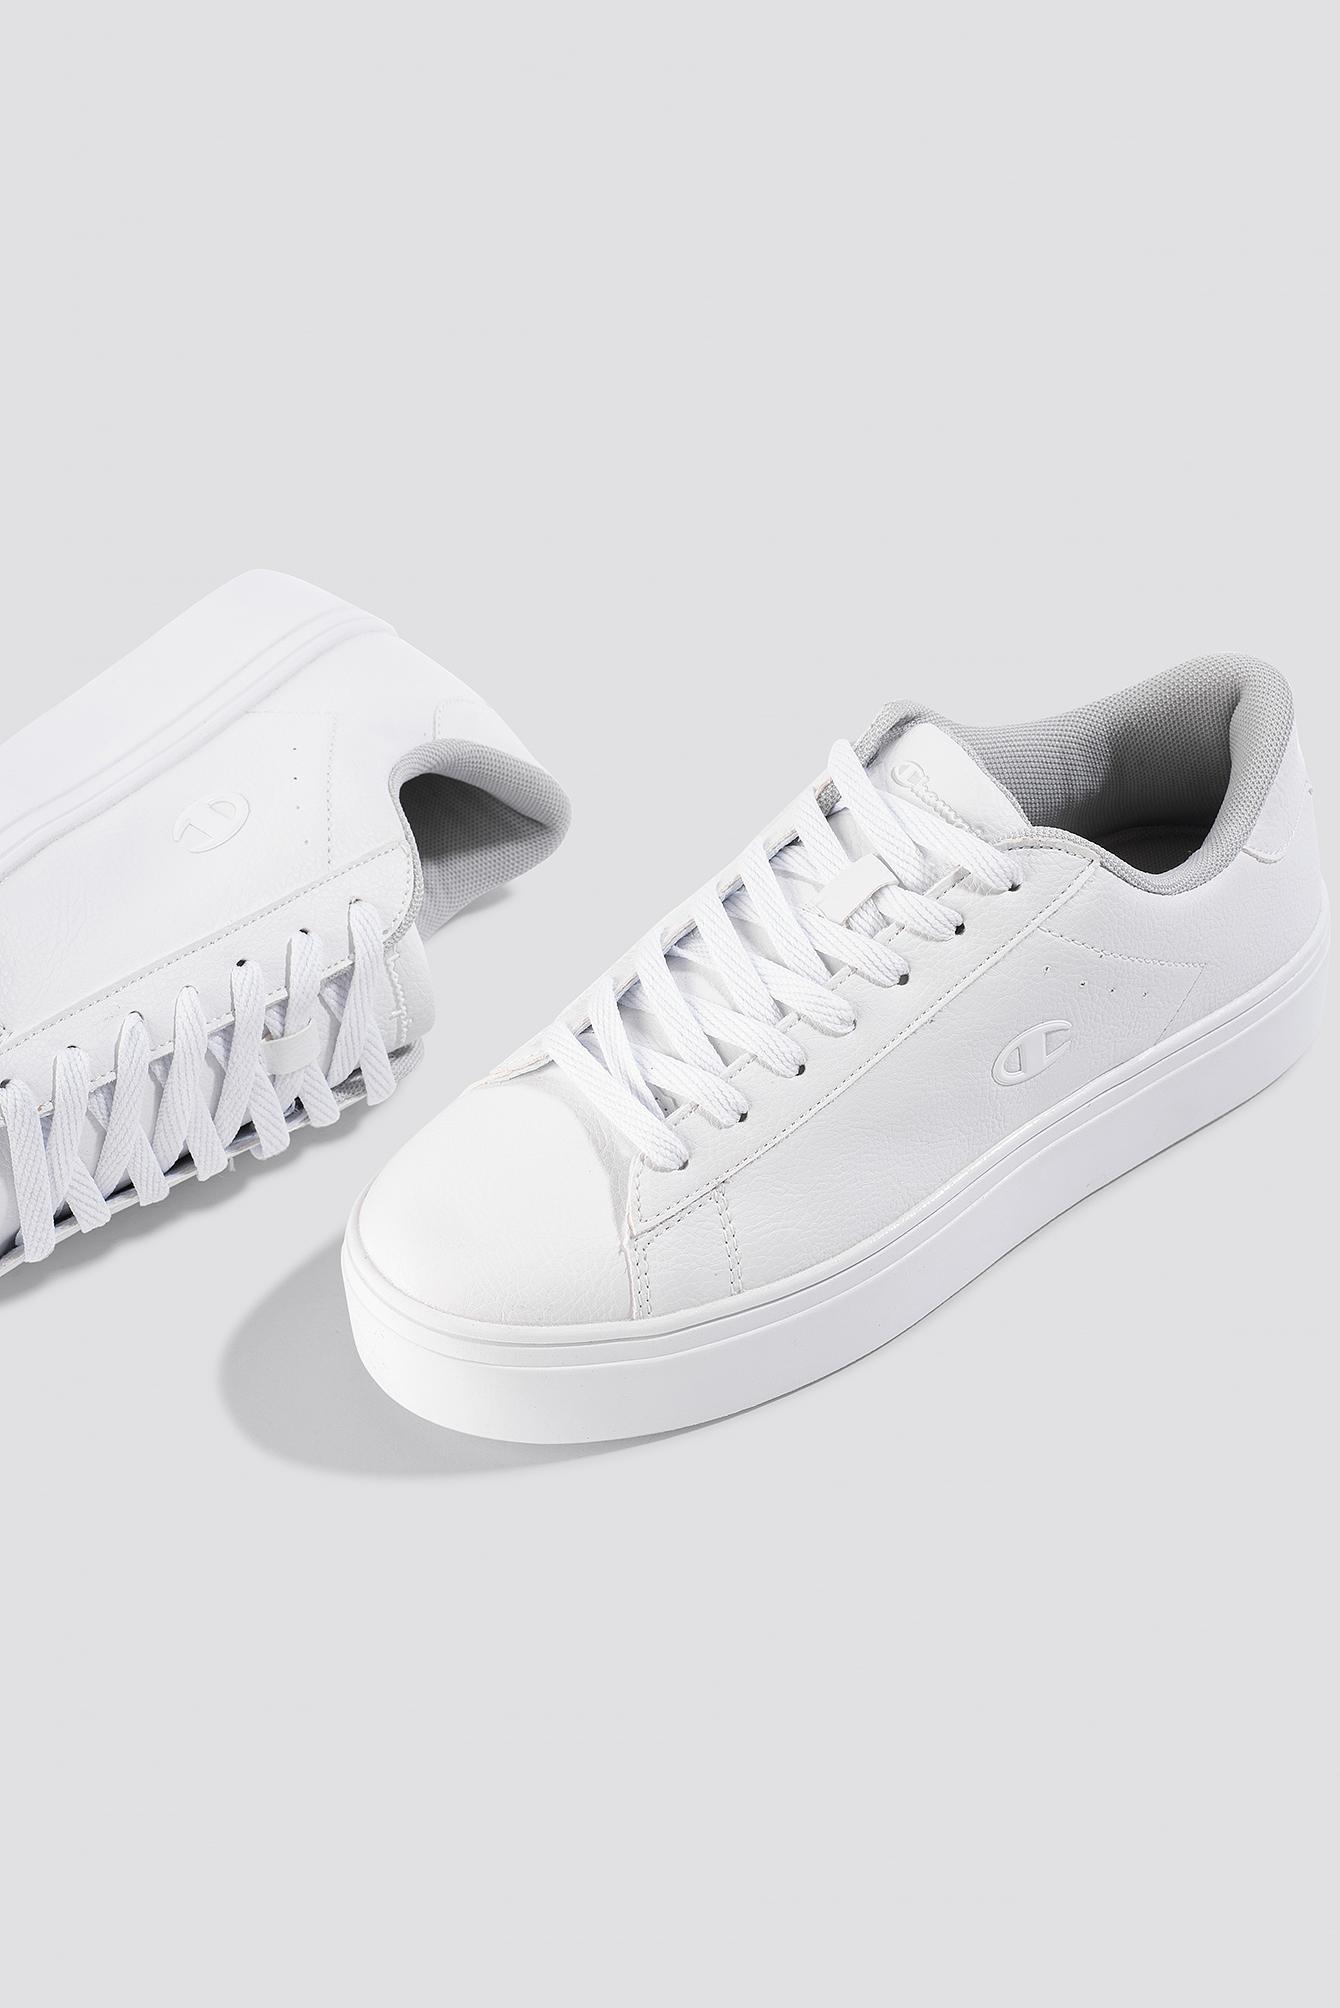 0fb46e424 Lyst - Champion Alex Platform Sneakers White in White